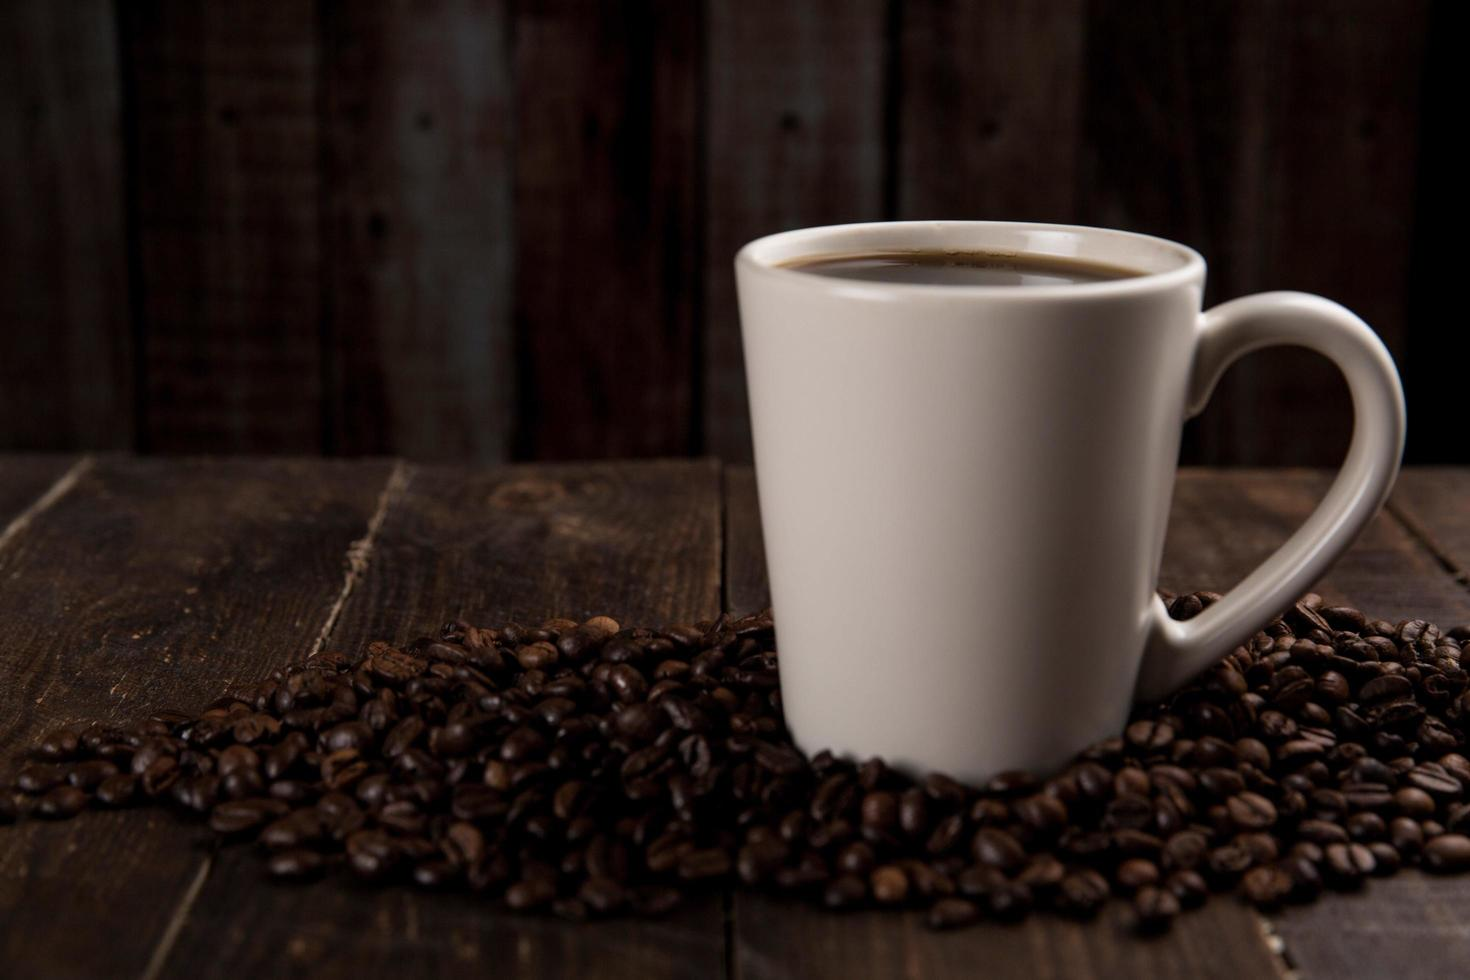 kaffemugg på mörk bakgrund foto